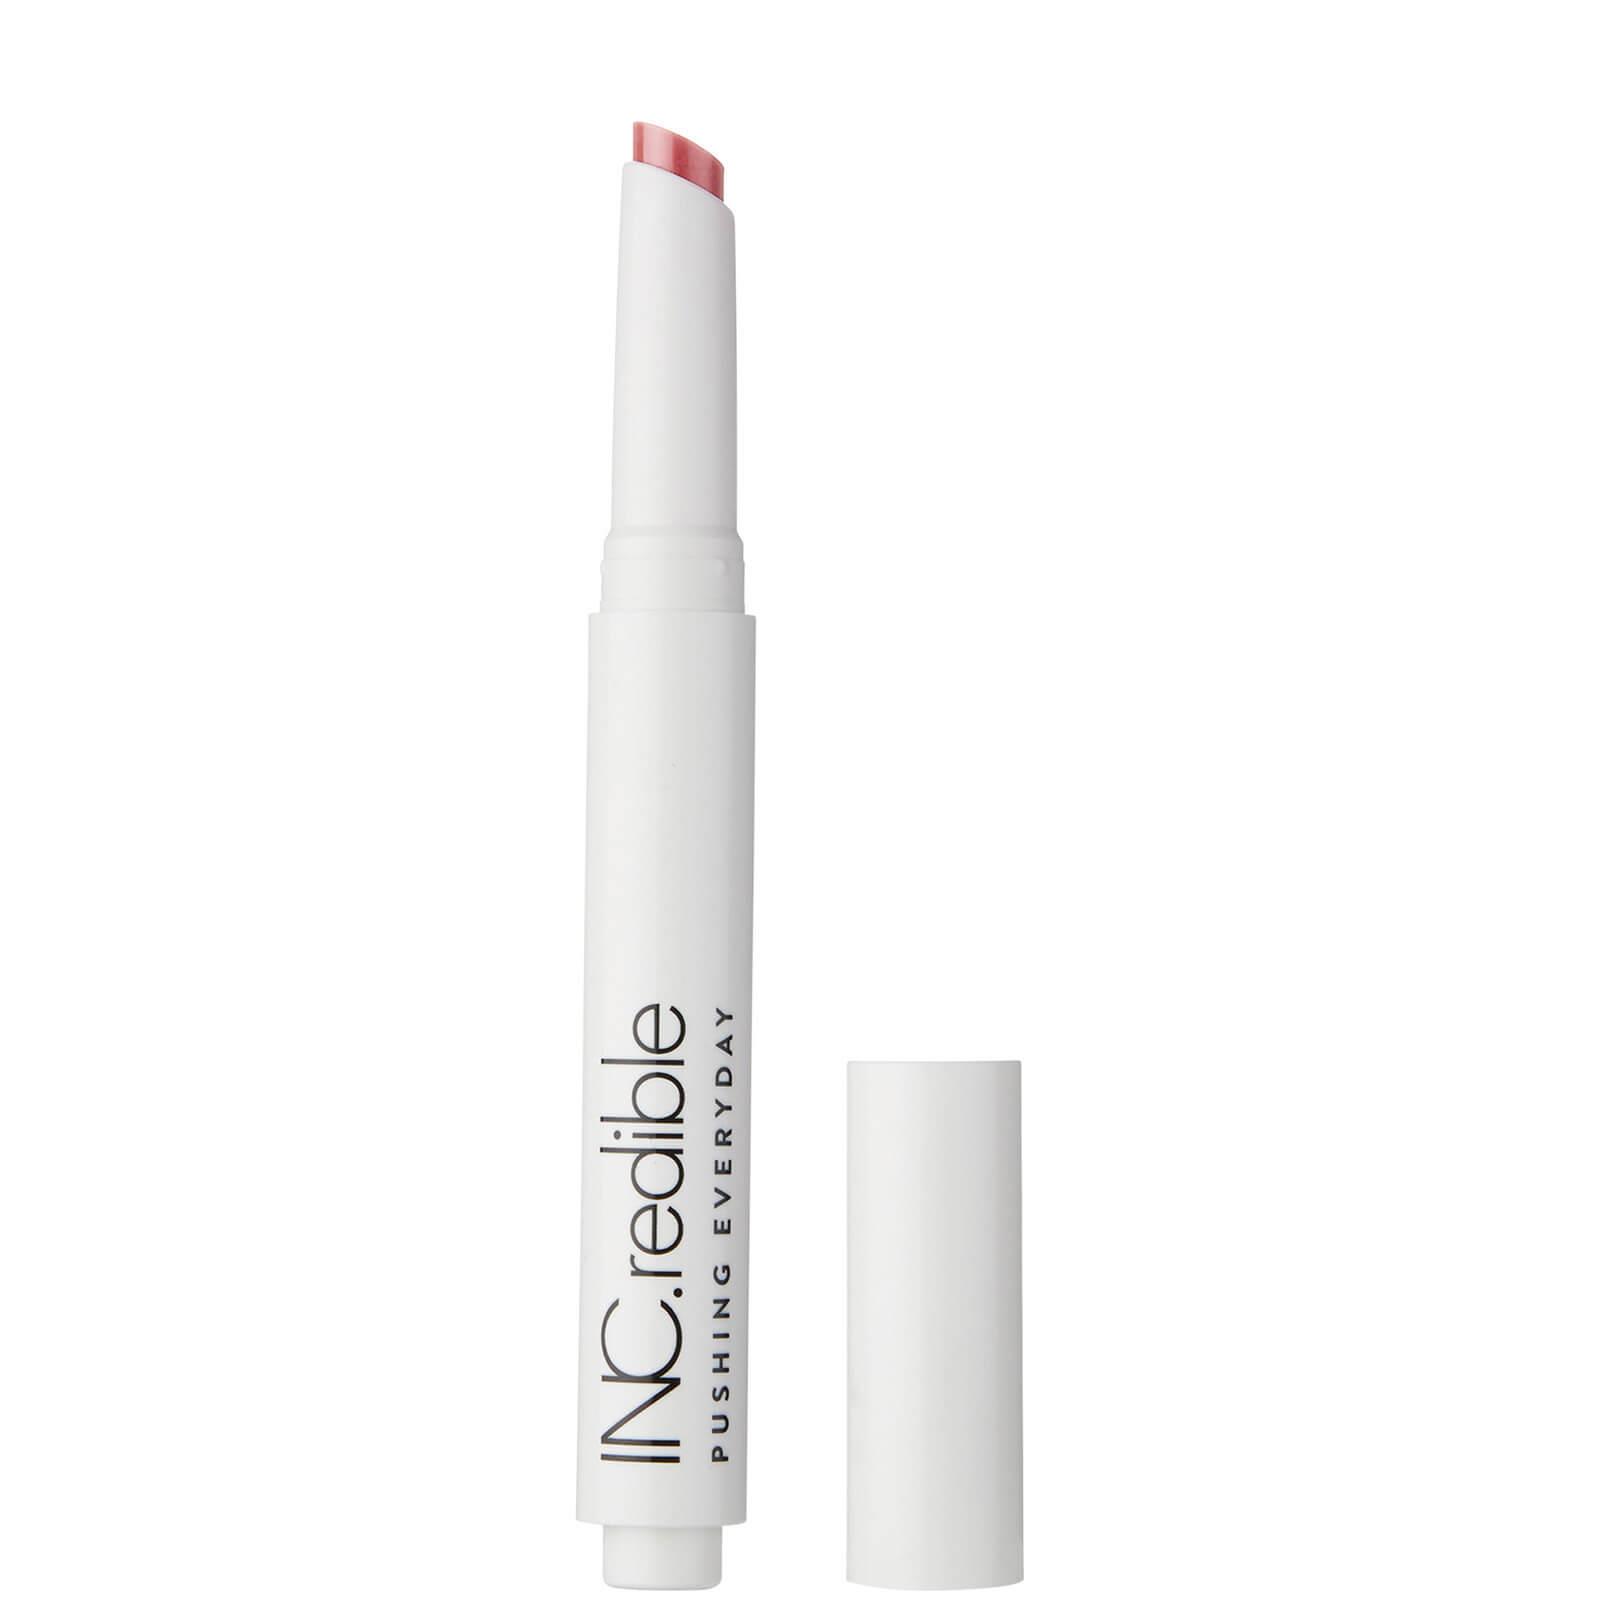 INC.redible Pushing Everyday rossetto semi-mat a pressione (varie tonalità) - Press Snooze